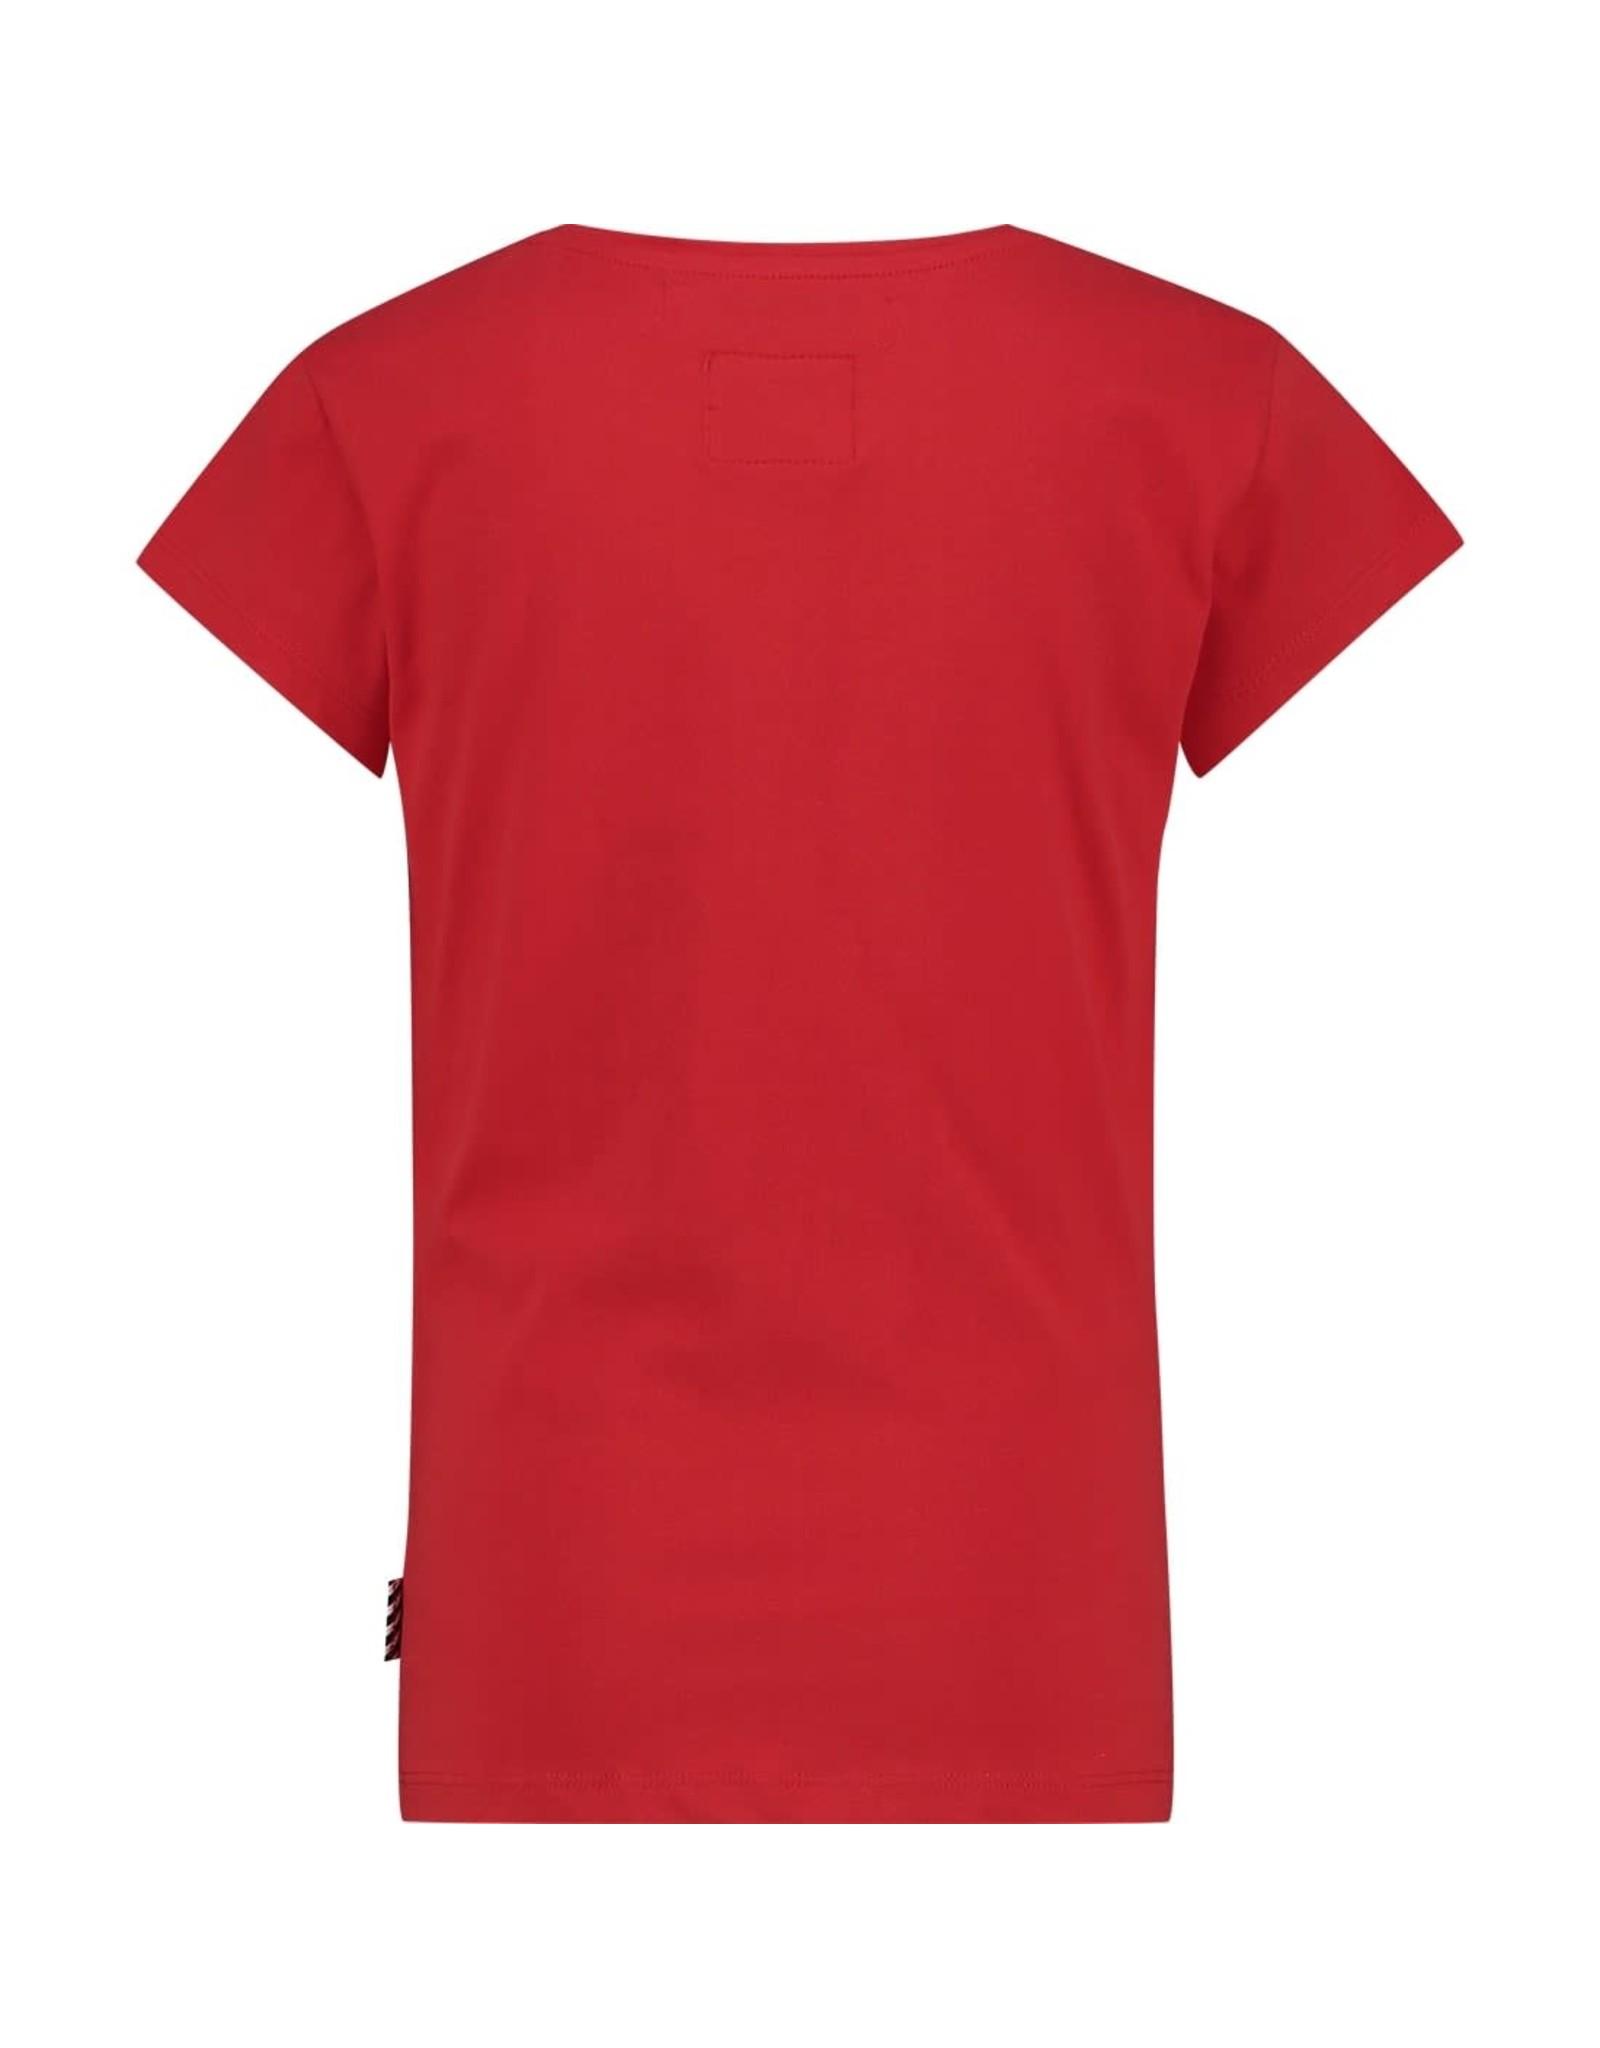 Vingino Vingino meiden Warchild t-shirt Lulu Red